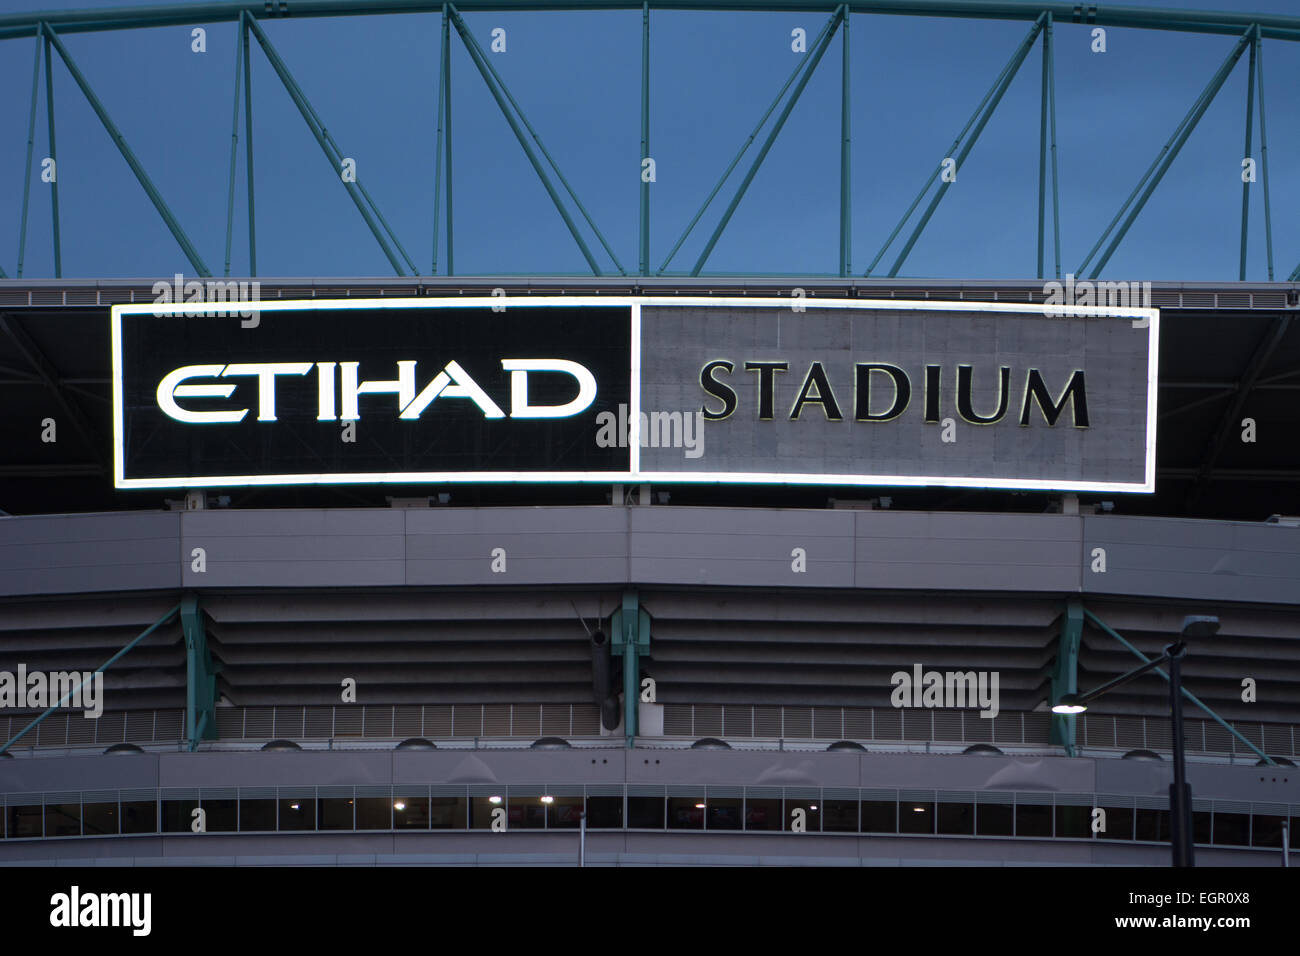 Melbourne Australia Etihad Stadium Sign Stock Photo - Alamy